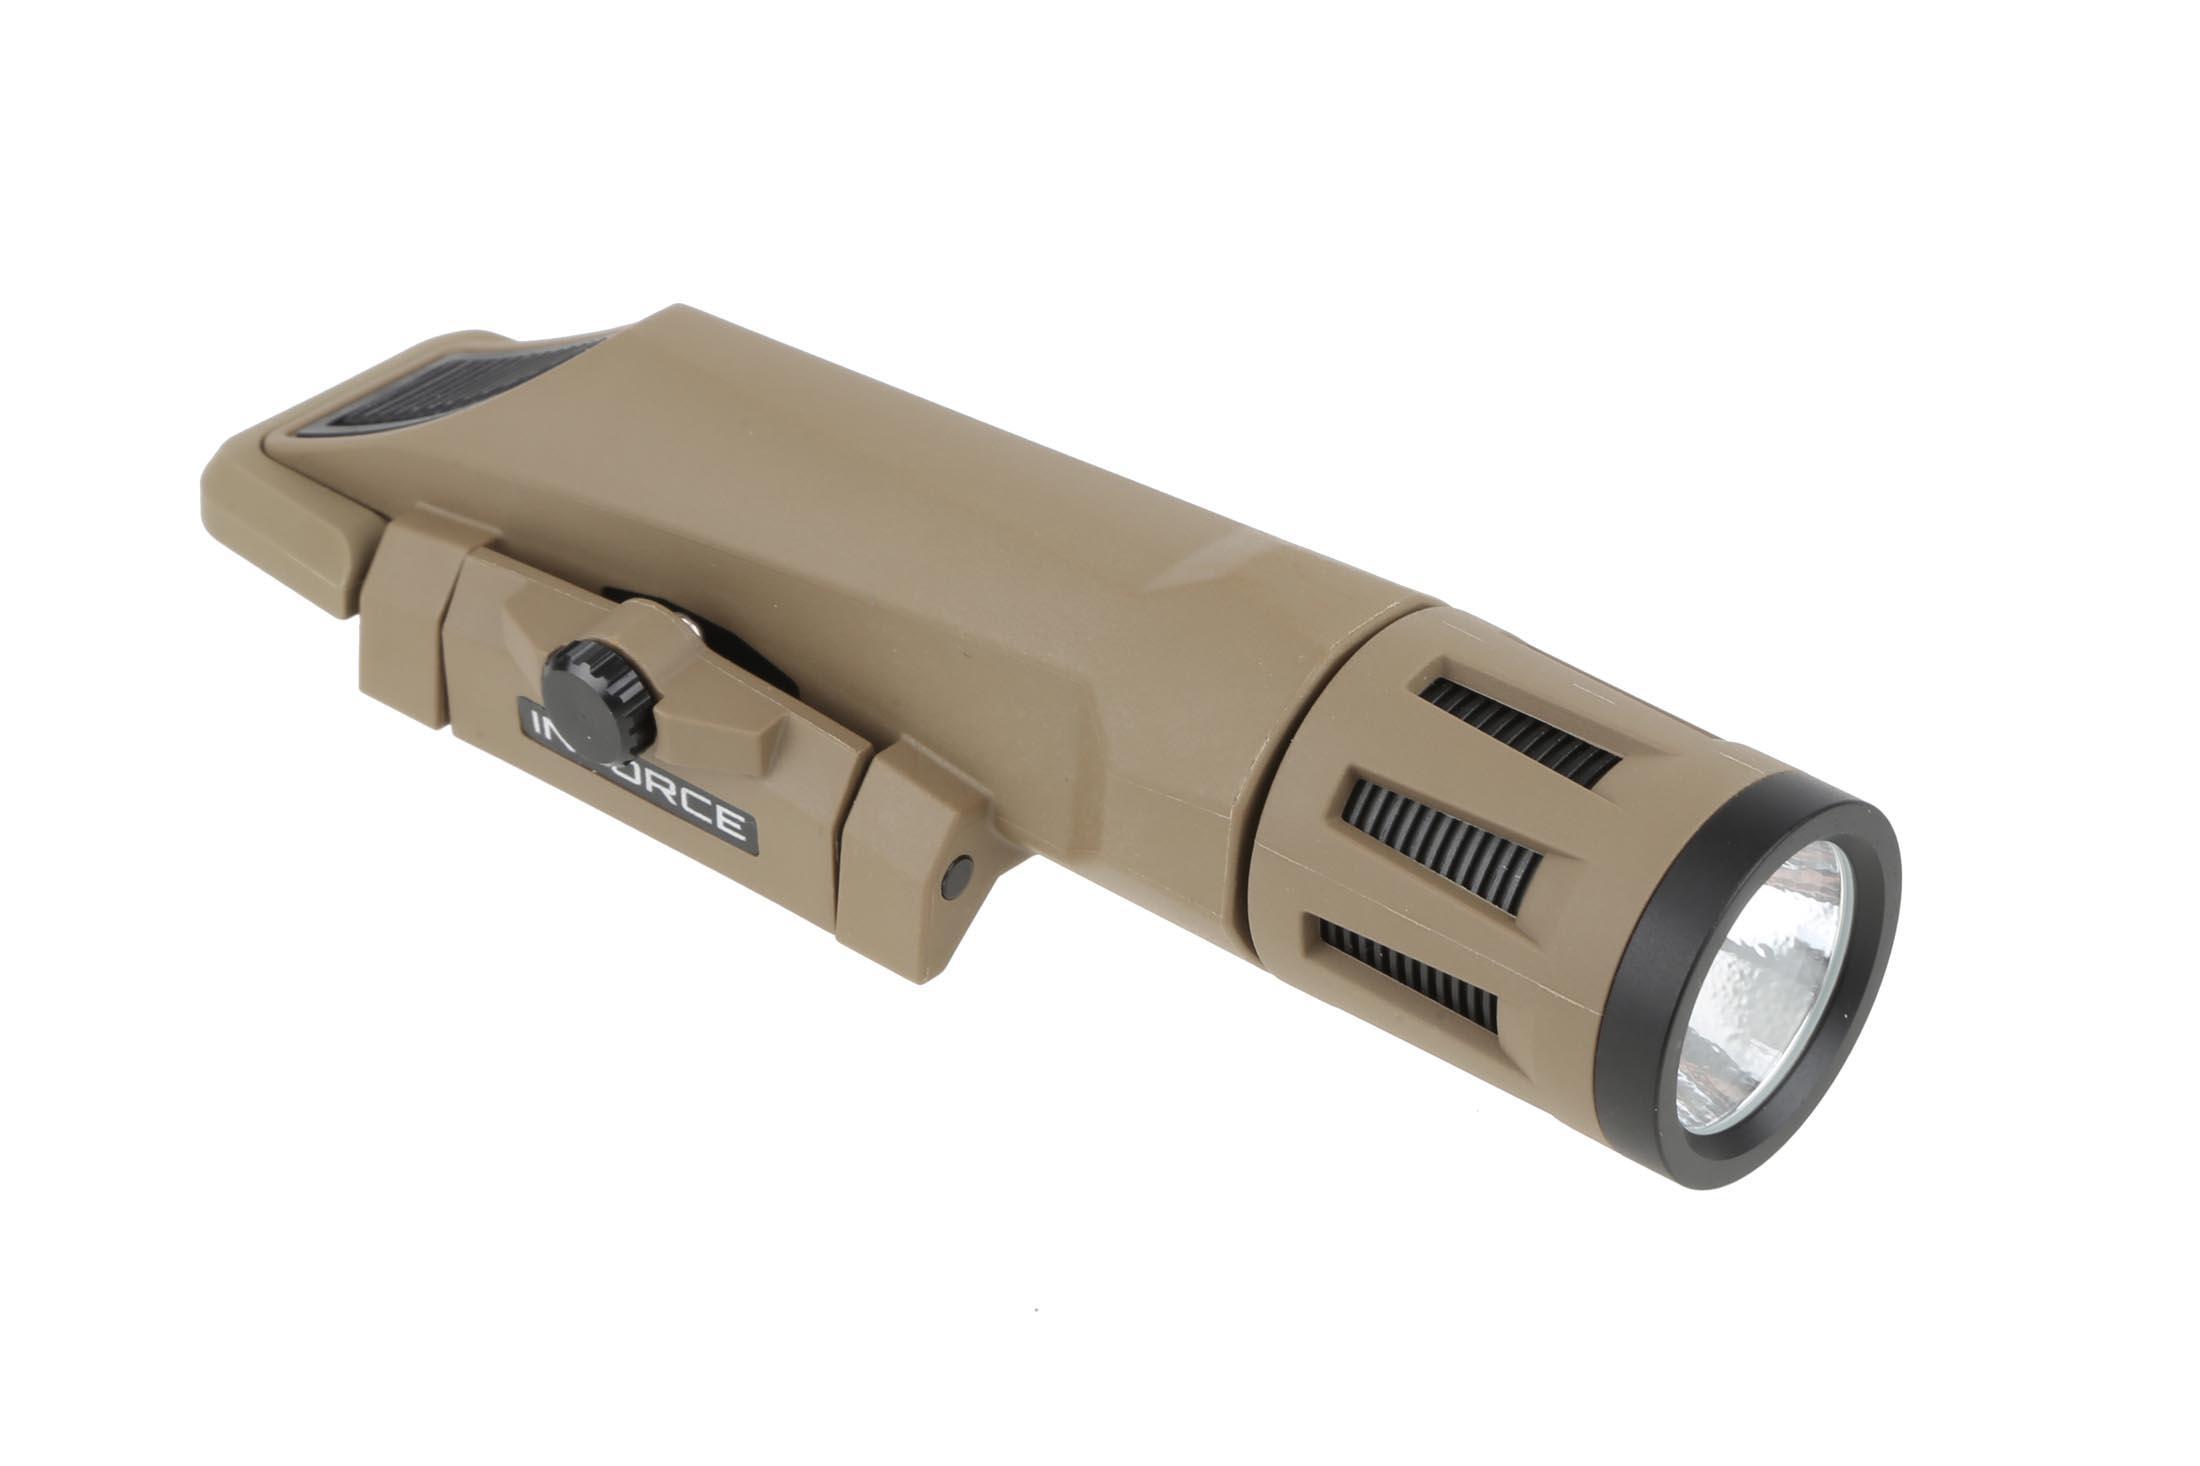 Inforce WMLx Gen 2 Weapon Mounted Light - 800 Lumens - FDE